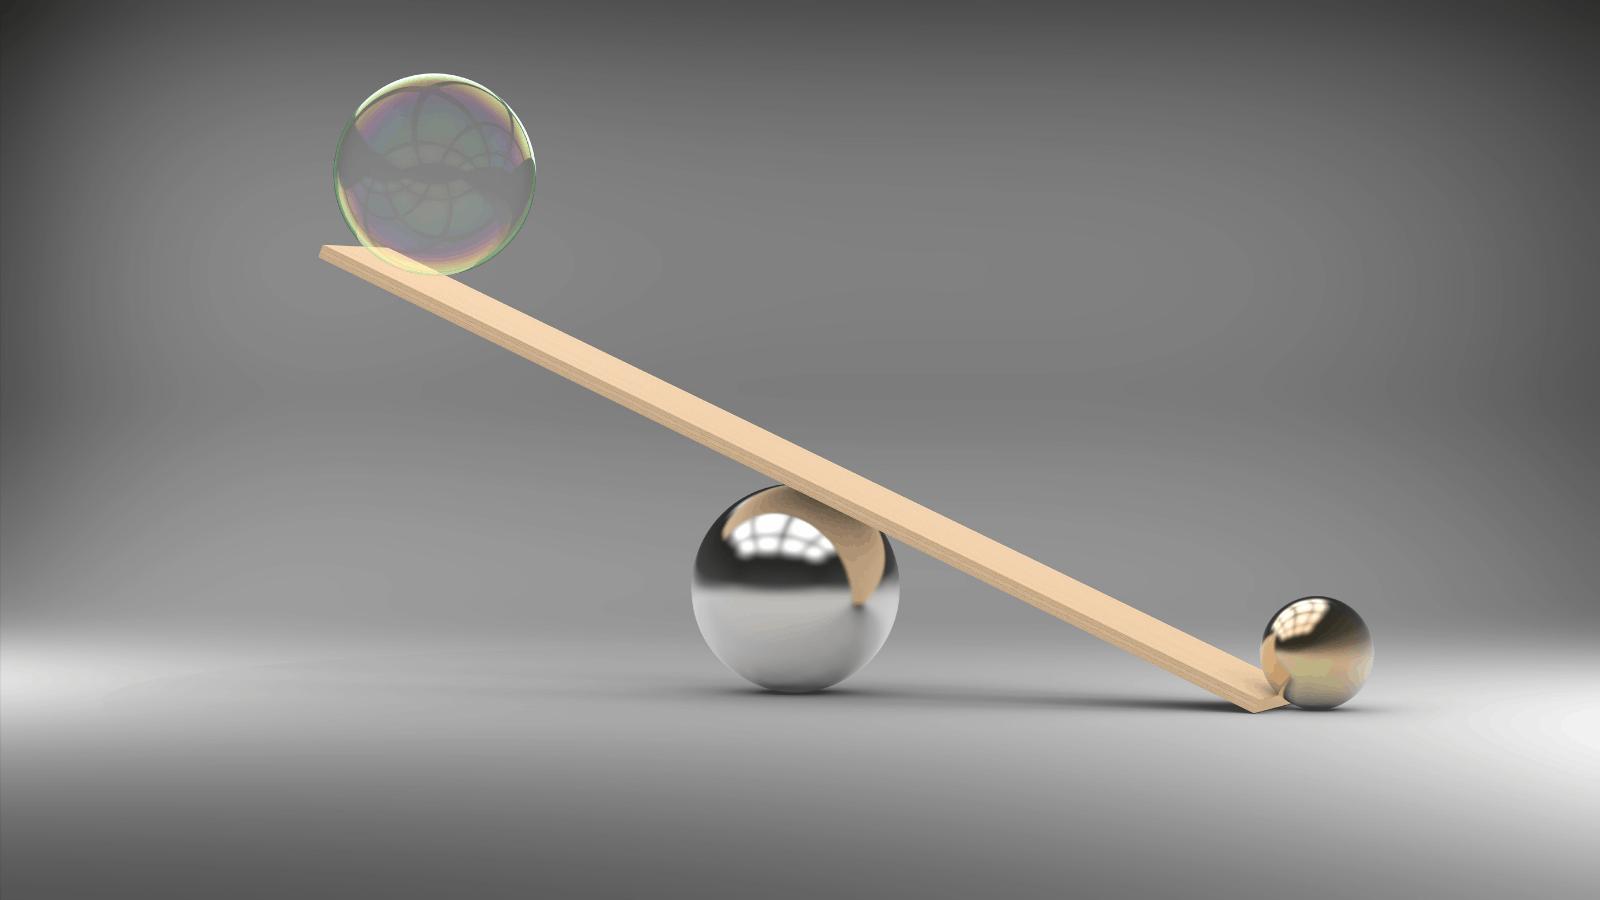 feel off-balance